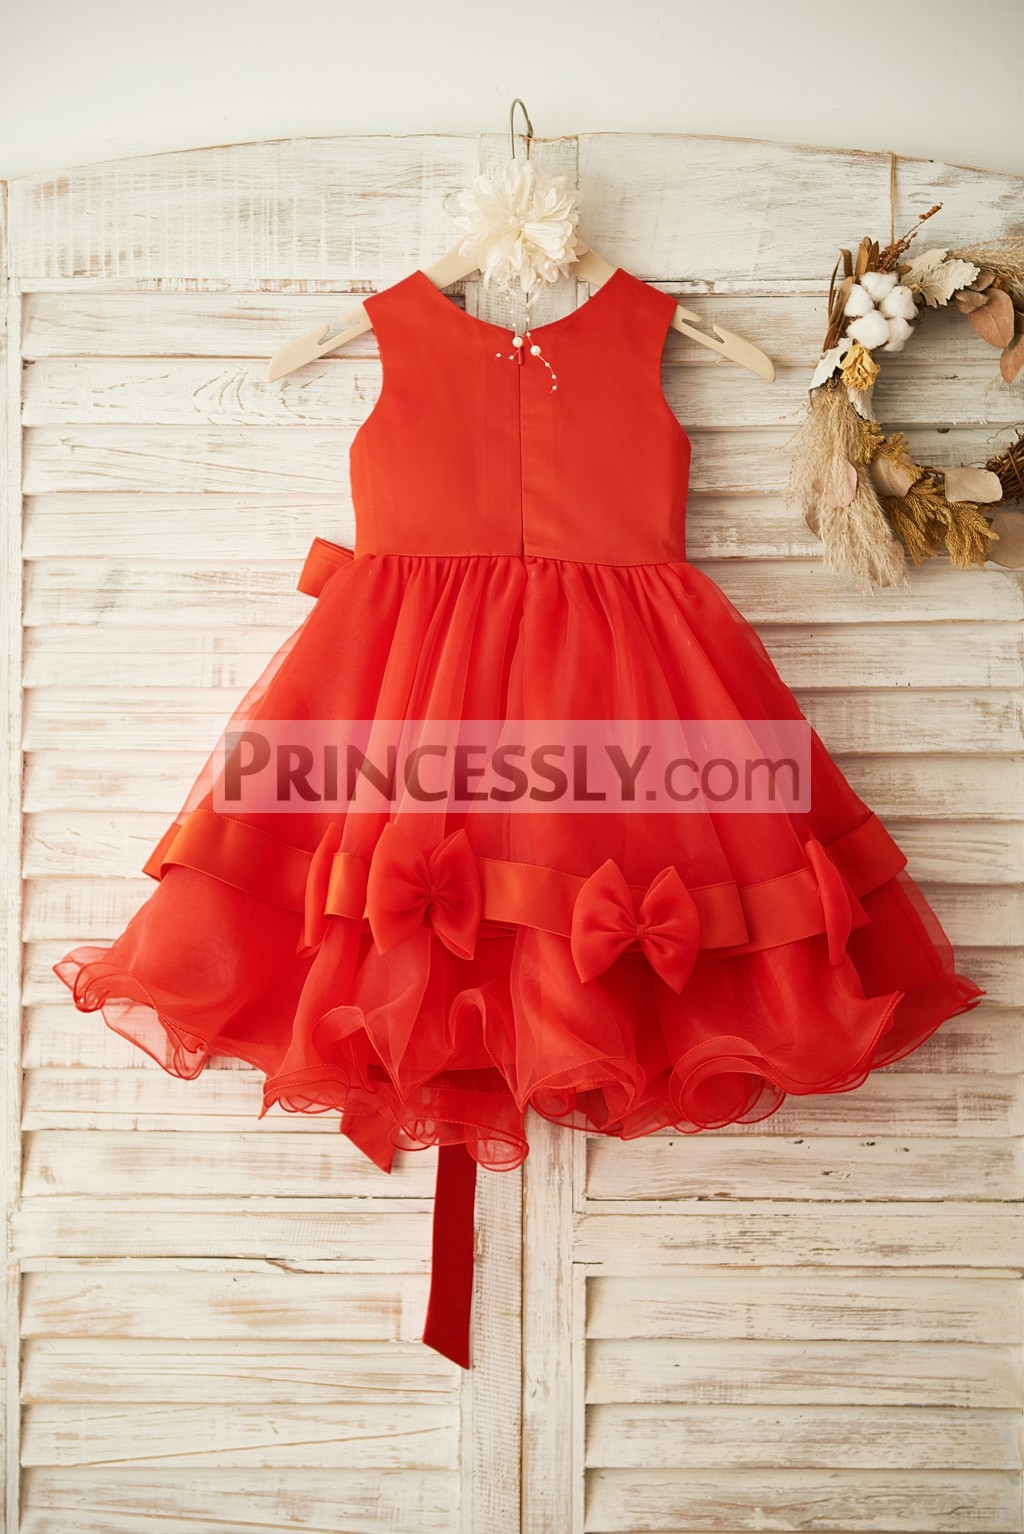 Panel Back of Bodice Ruffles Organza Skirt Wedding Baby Little Girl Dress